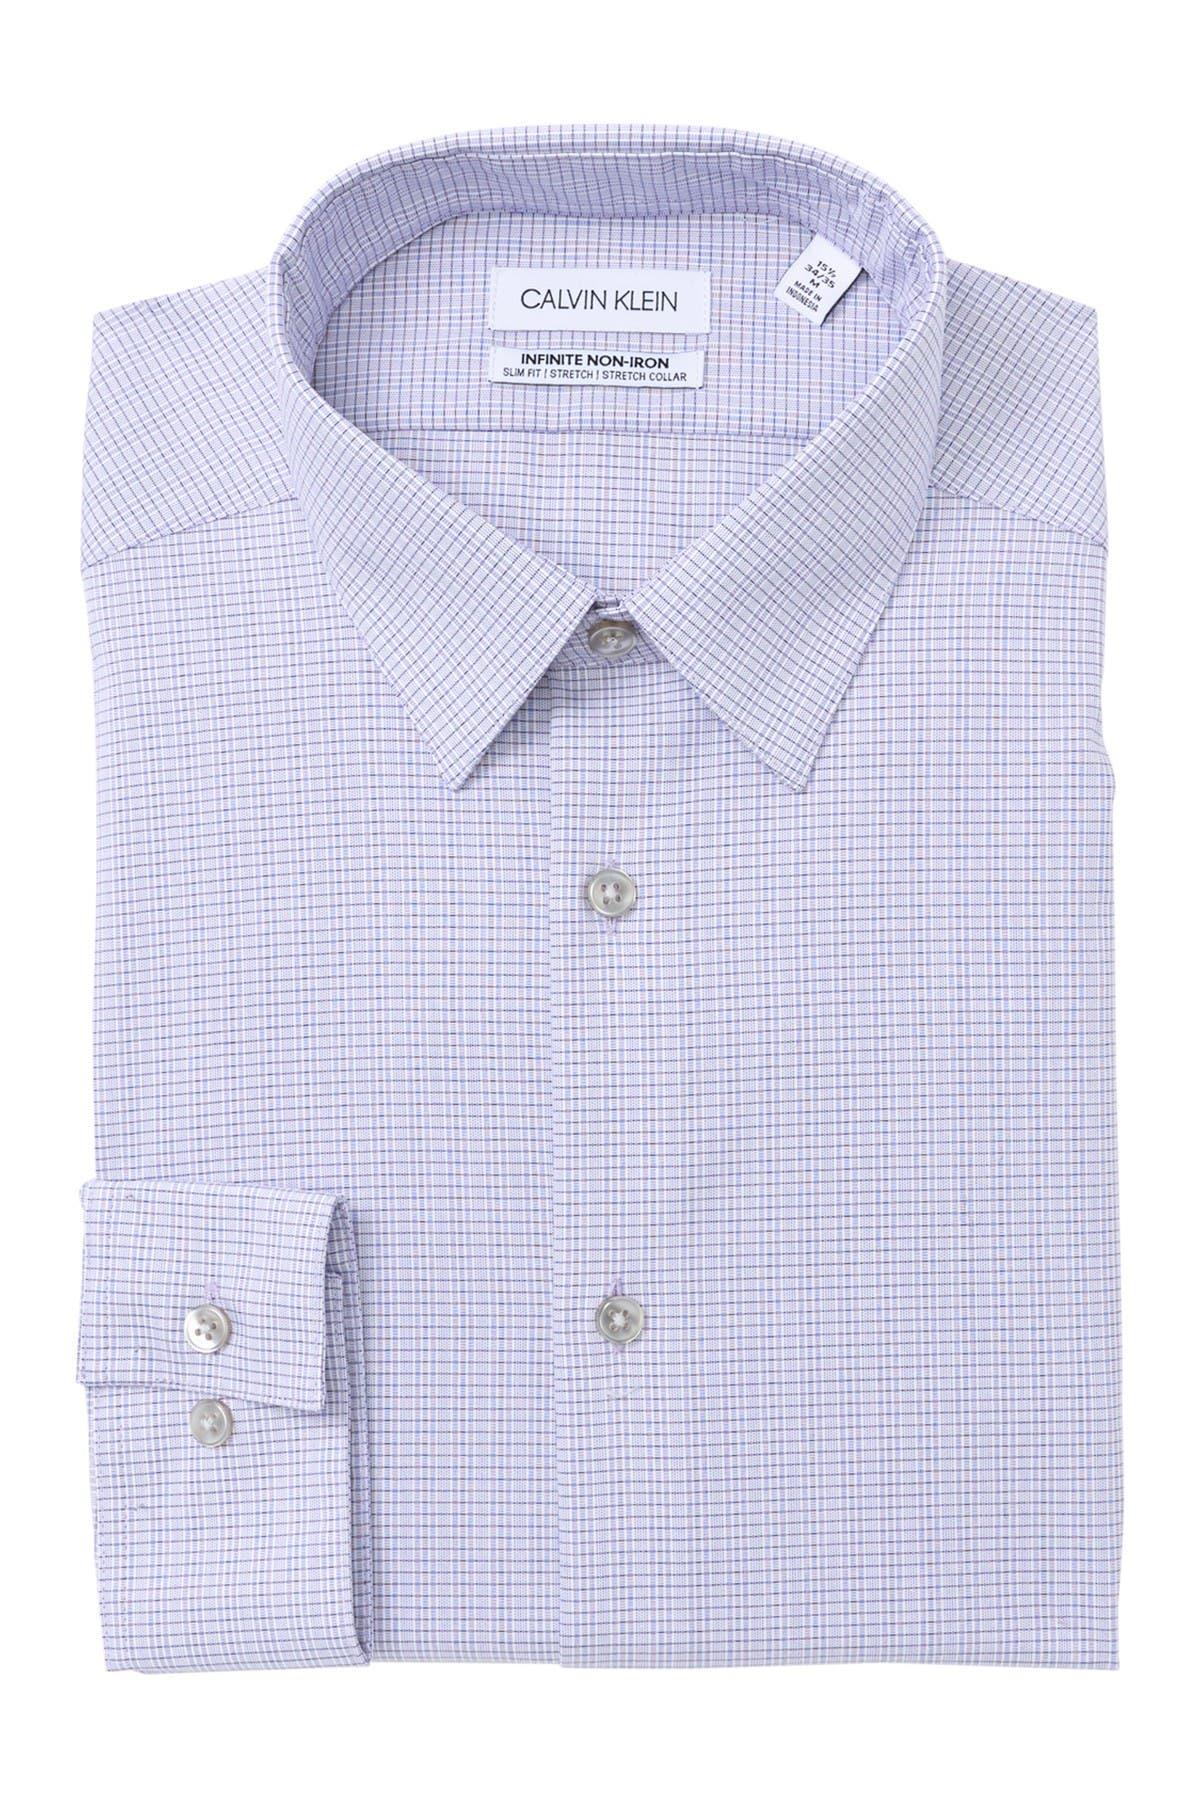 Image of Calvin Klein Non-Iron Slim Fit Stretch Dress Shirt